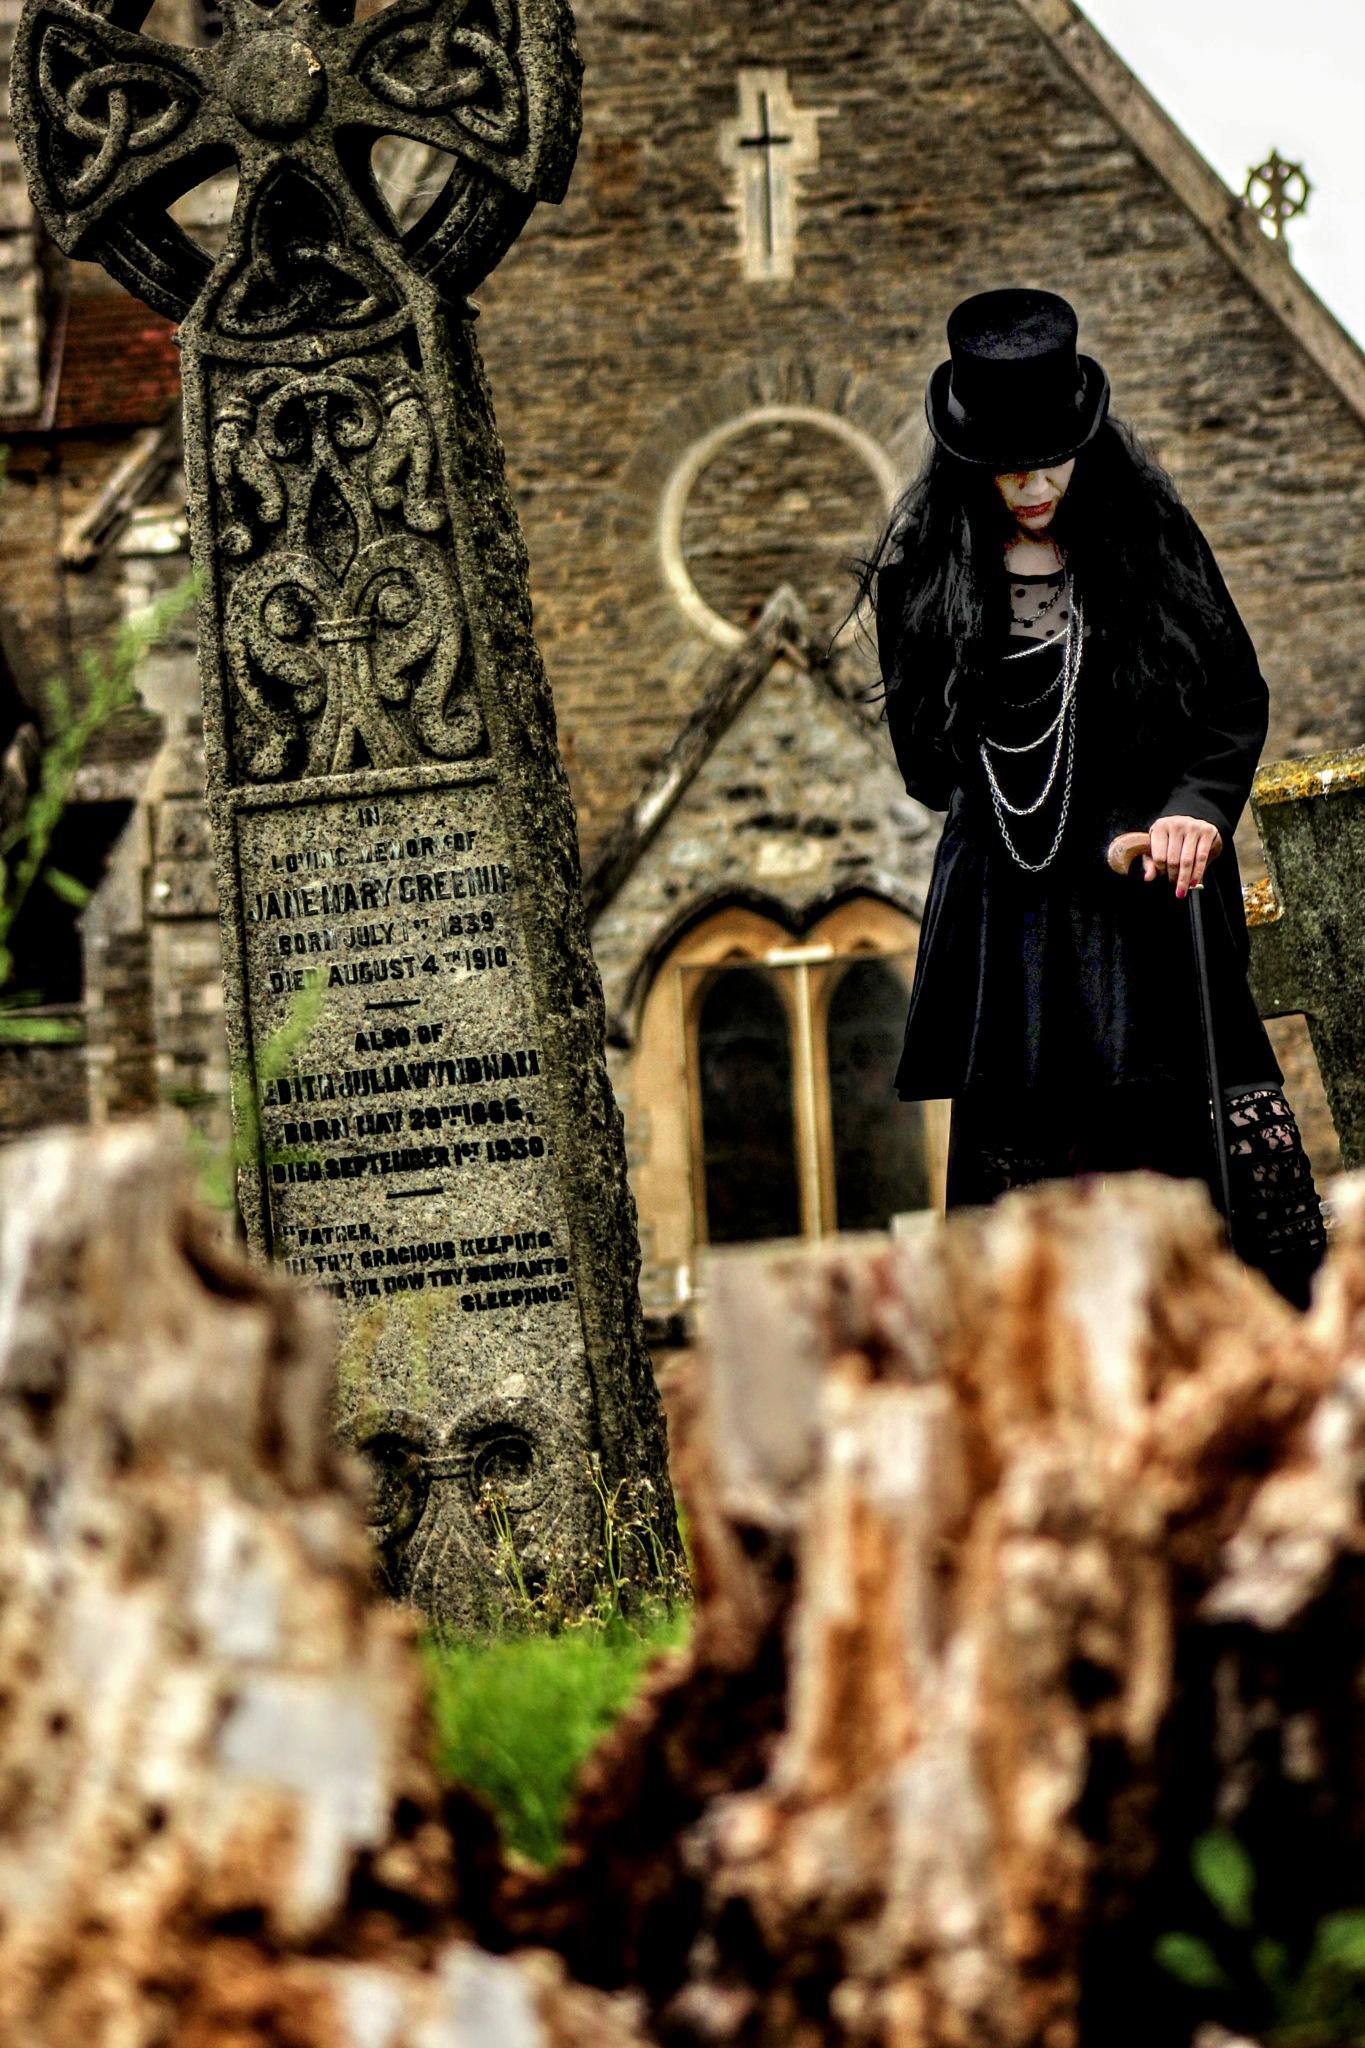 Graveyard Shift by MartinIngley